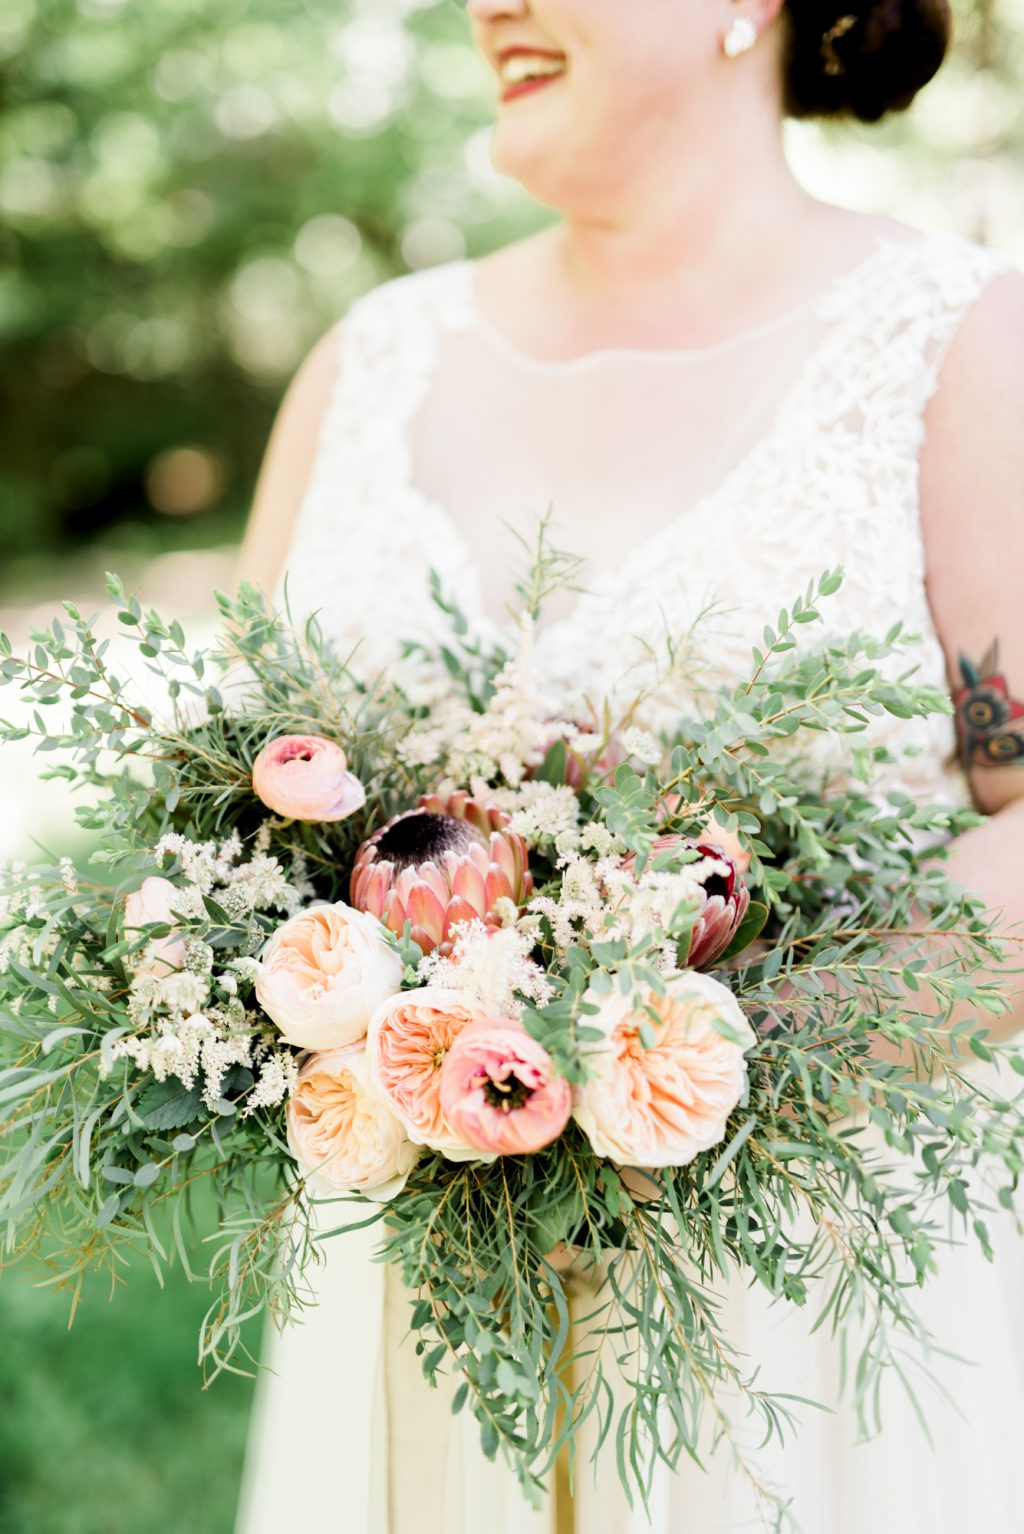 haley-richter-photo-west-chester-summer-wedding-boxcar-brewery-054